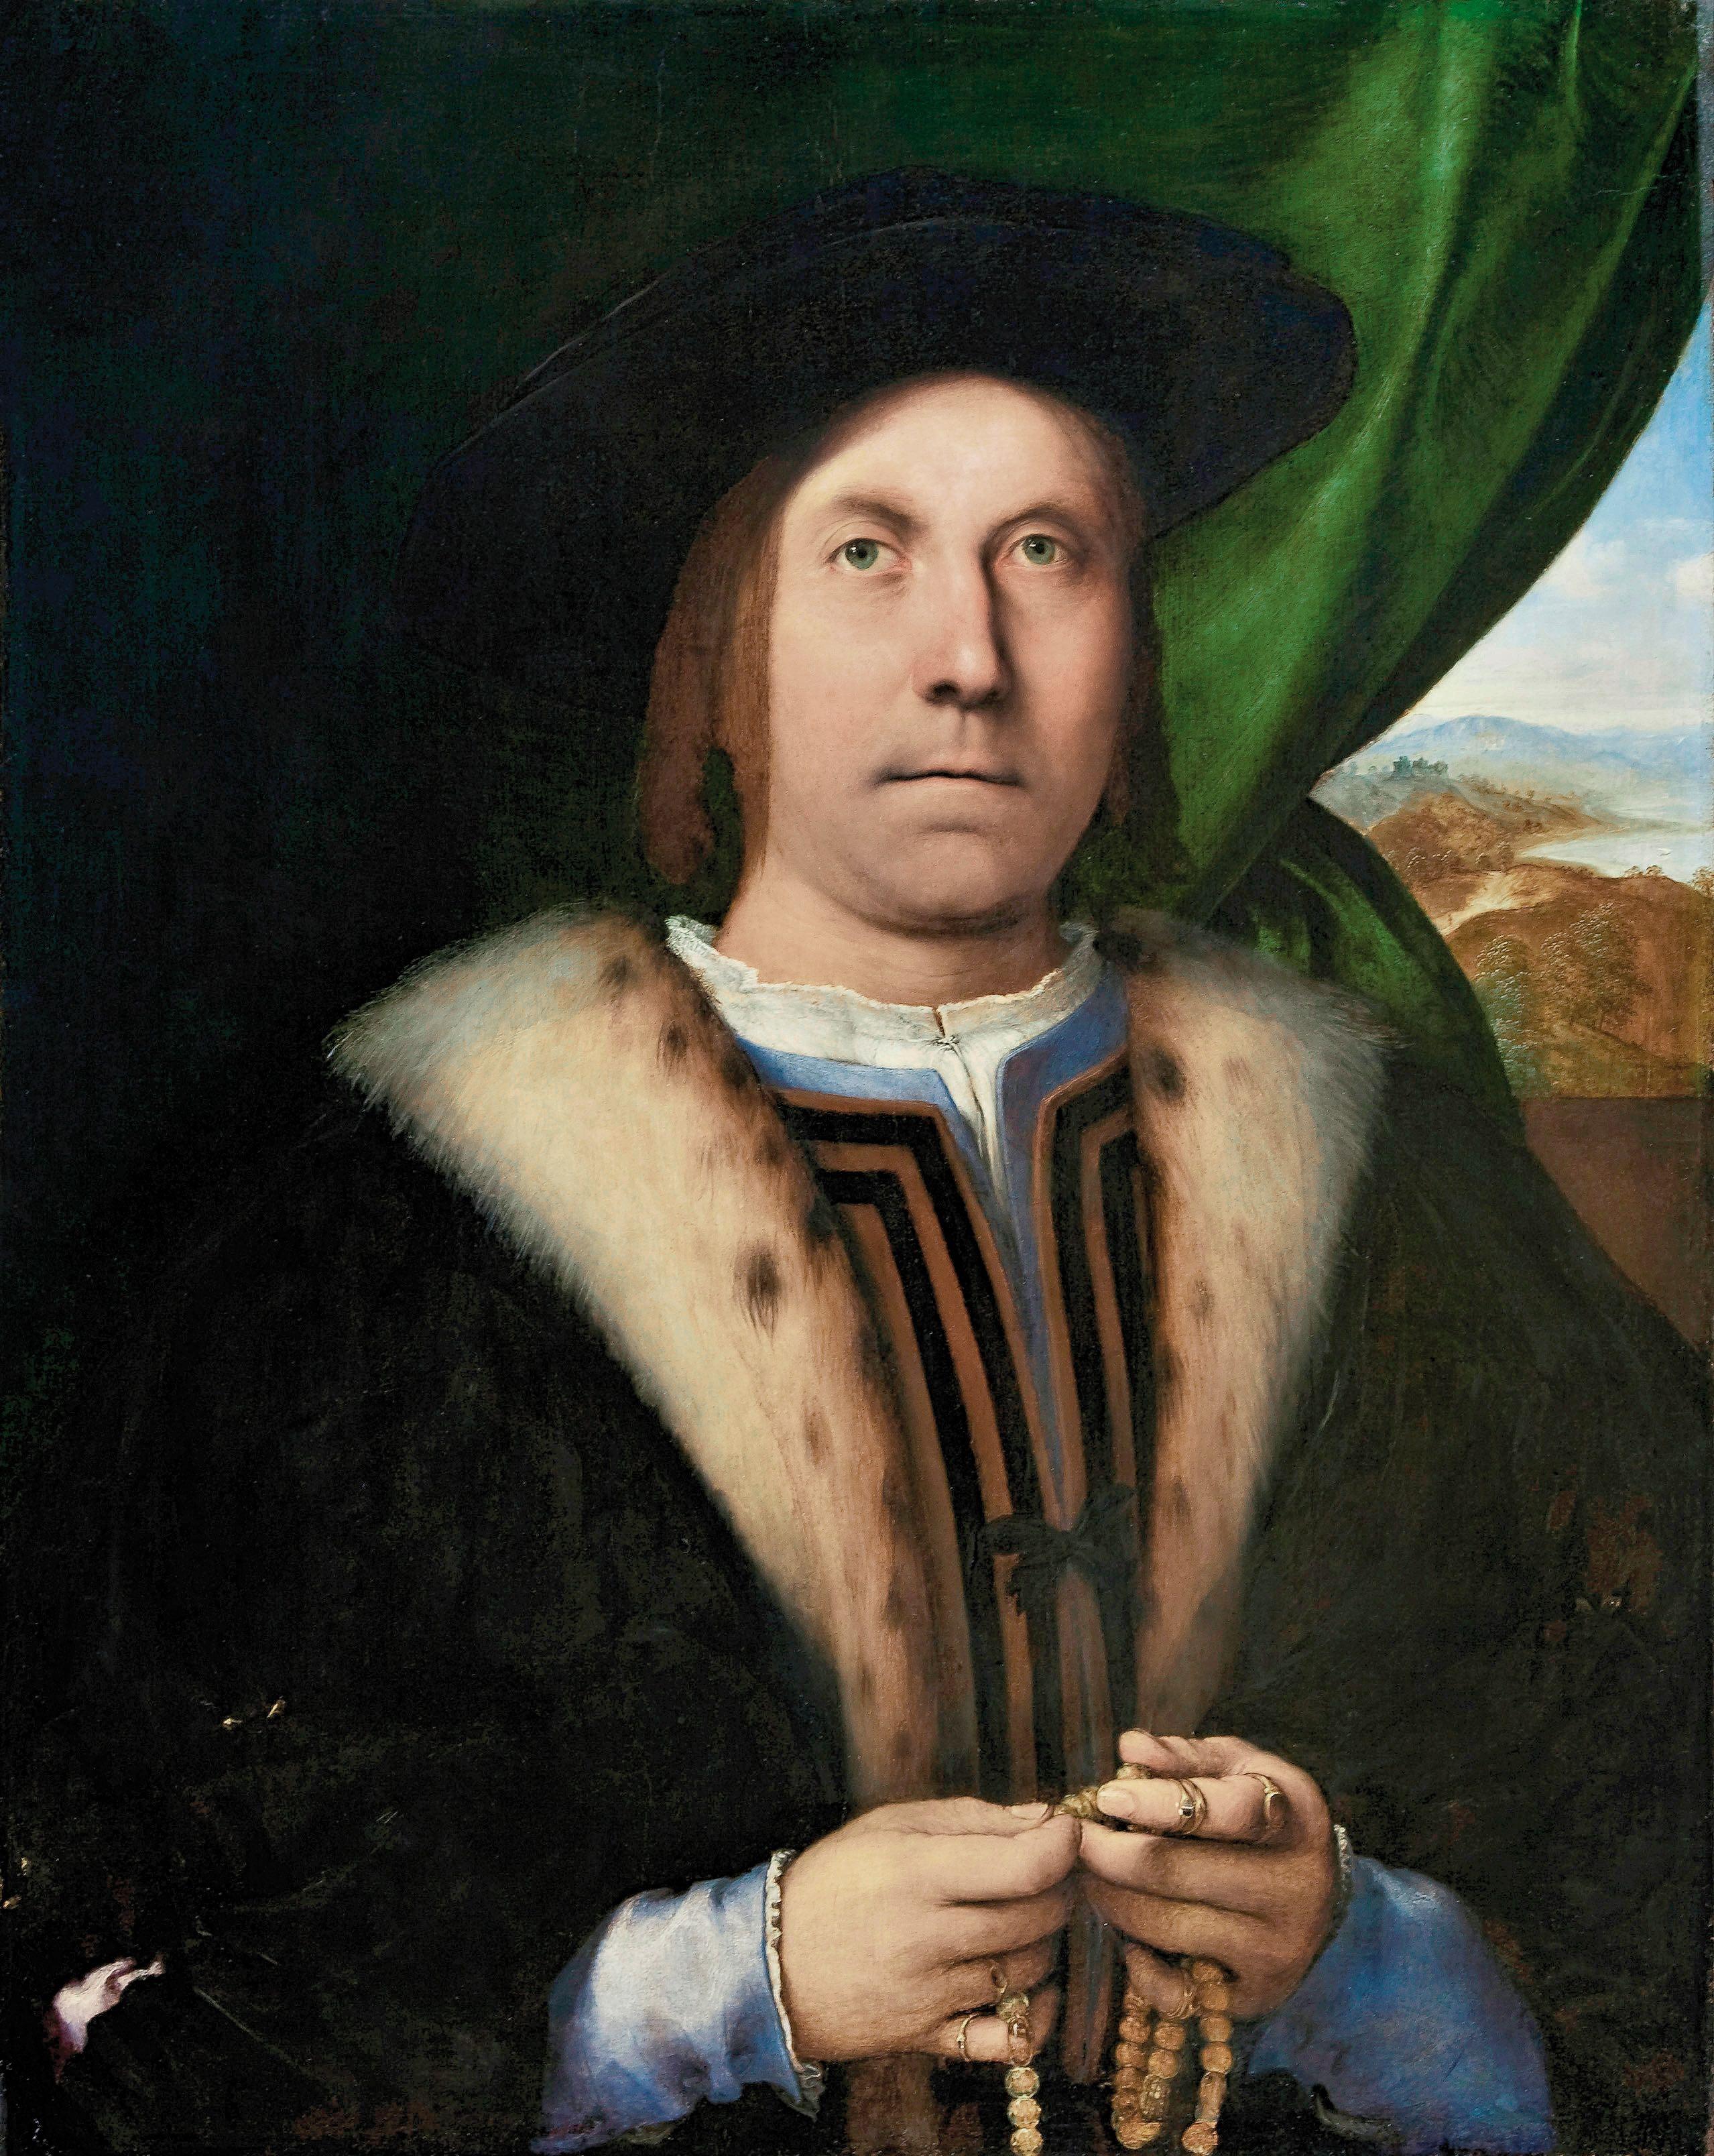 Lorenzo Lotto, Mandsportræt, ca. 1520